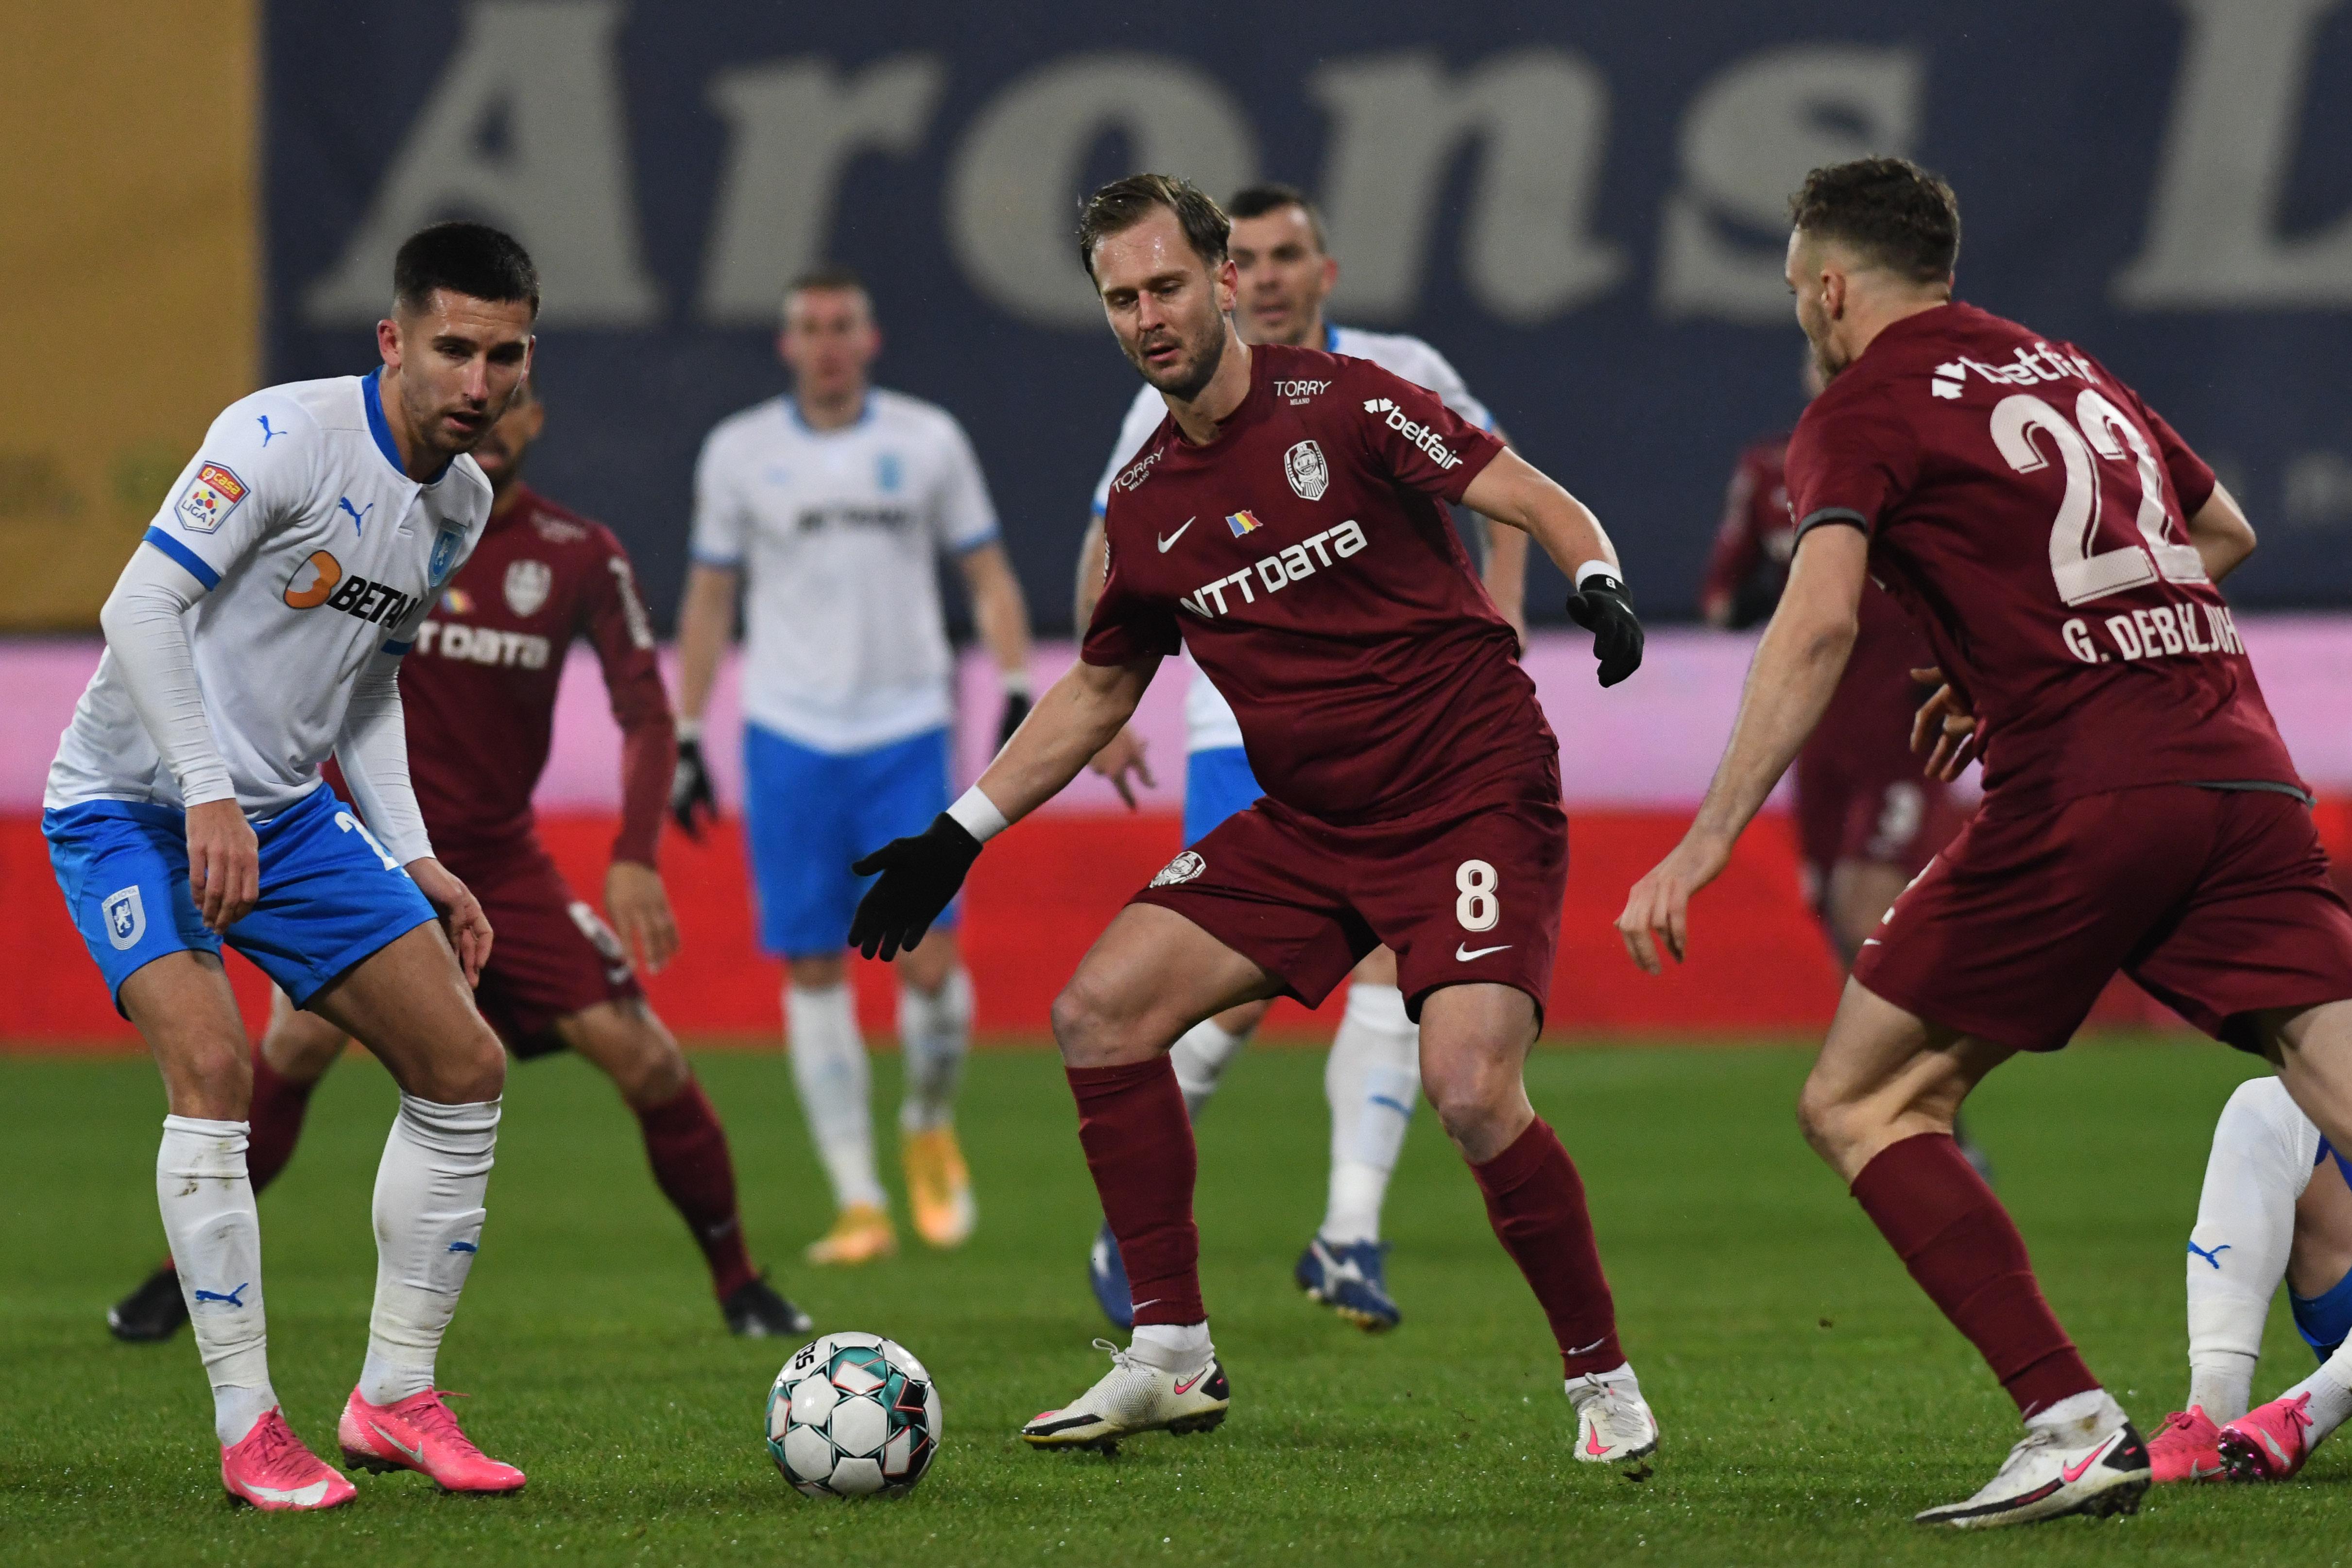 Damjan Djoković a fost transferat de la CFR Cluj la formaţia turcă Çaykur Rizespor